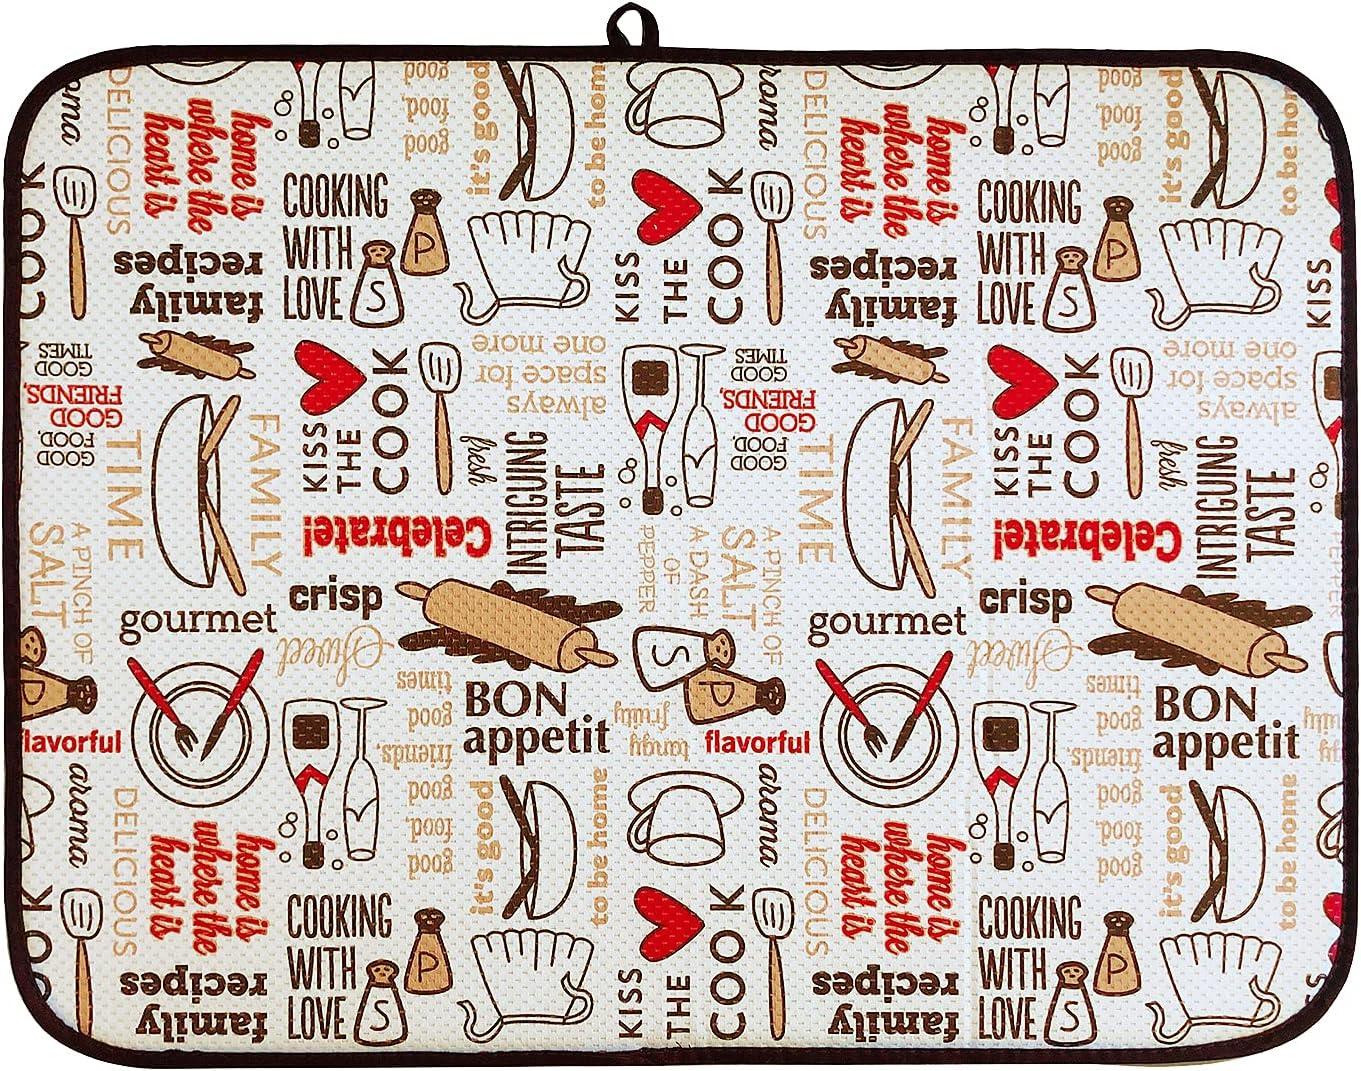 DRWhem Alfombrilla de secado para platos de microfibra, 45,7 x 60,9 cm, antideslizante, superabsorbente, reversible, con corazón, para cocina o fregadero